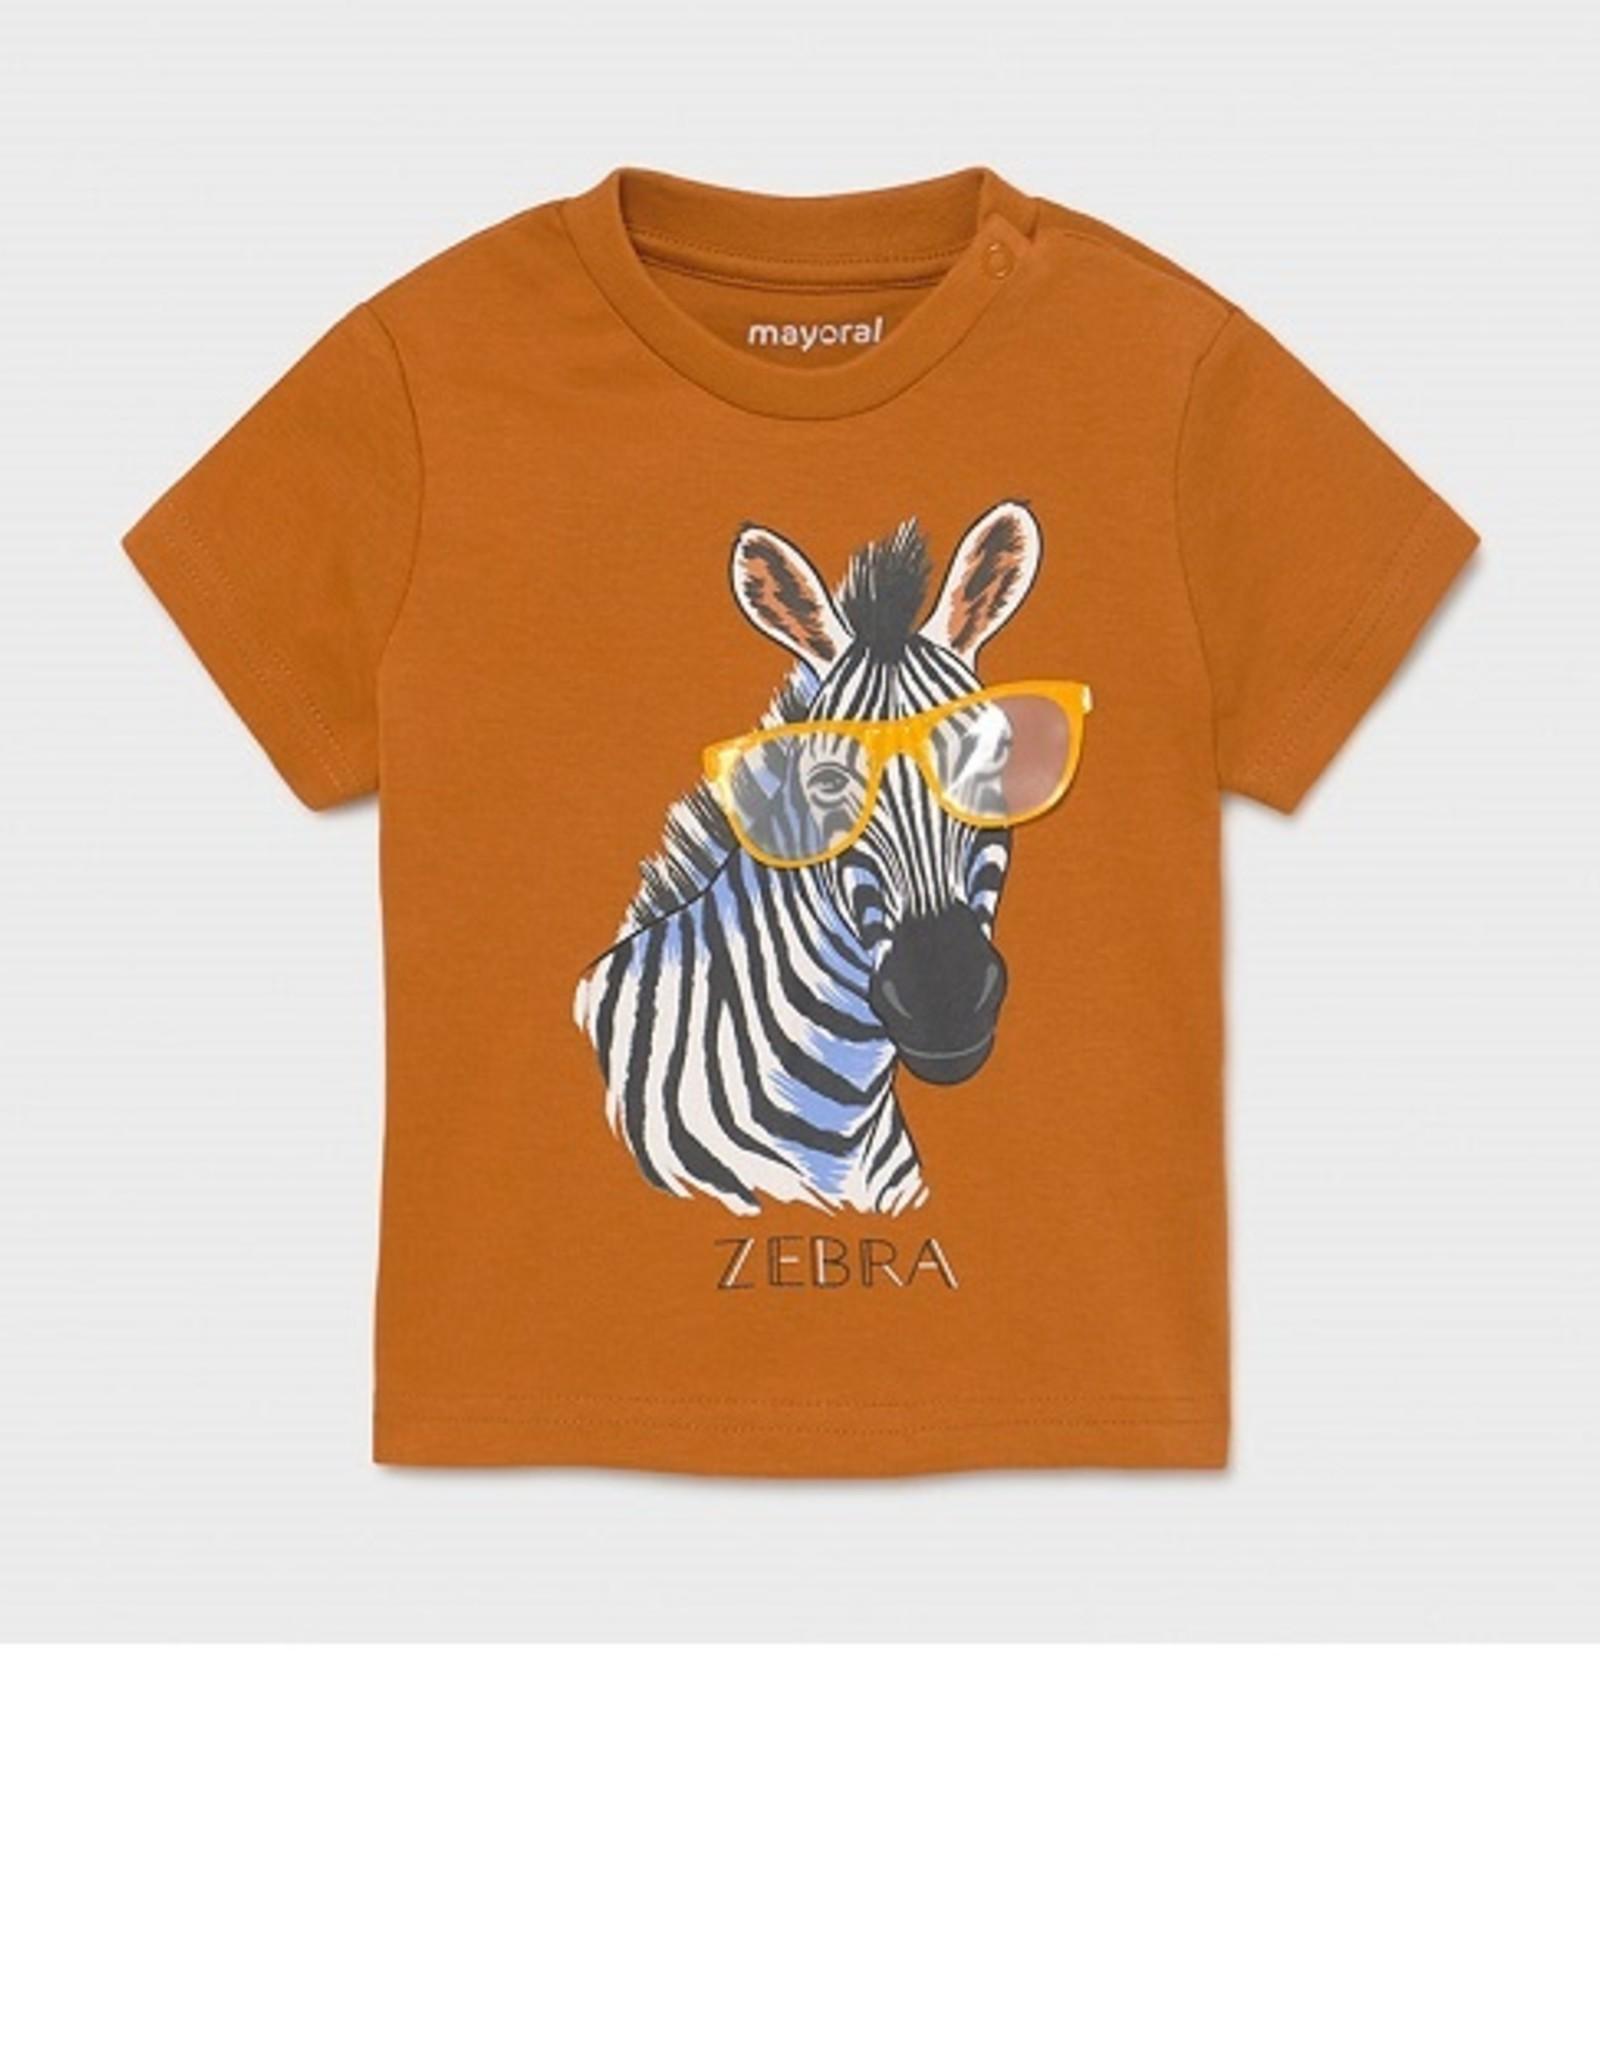 Mayoral T-shirt camel Zebra